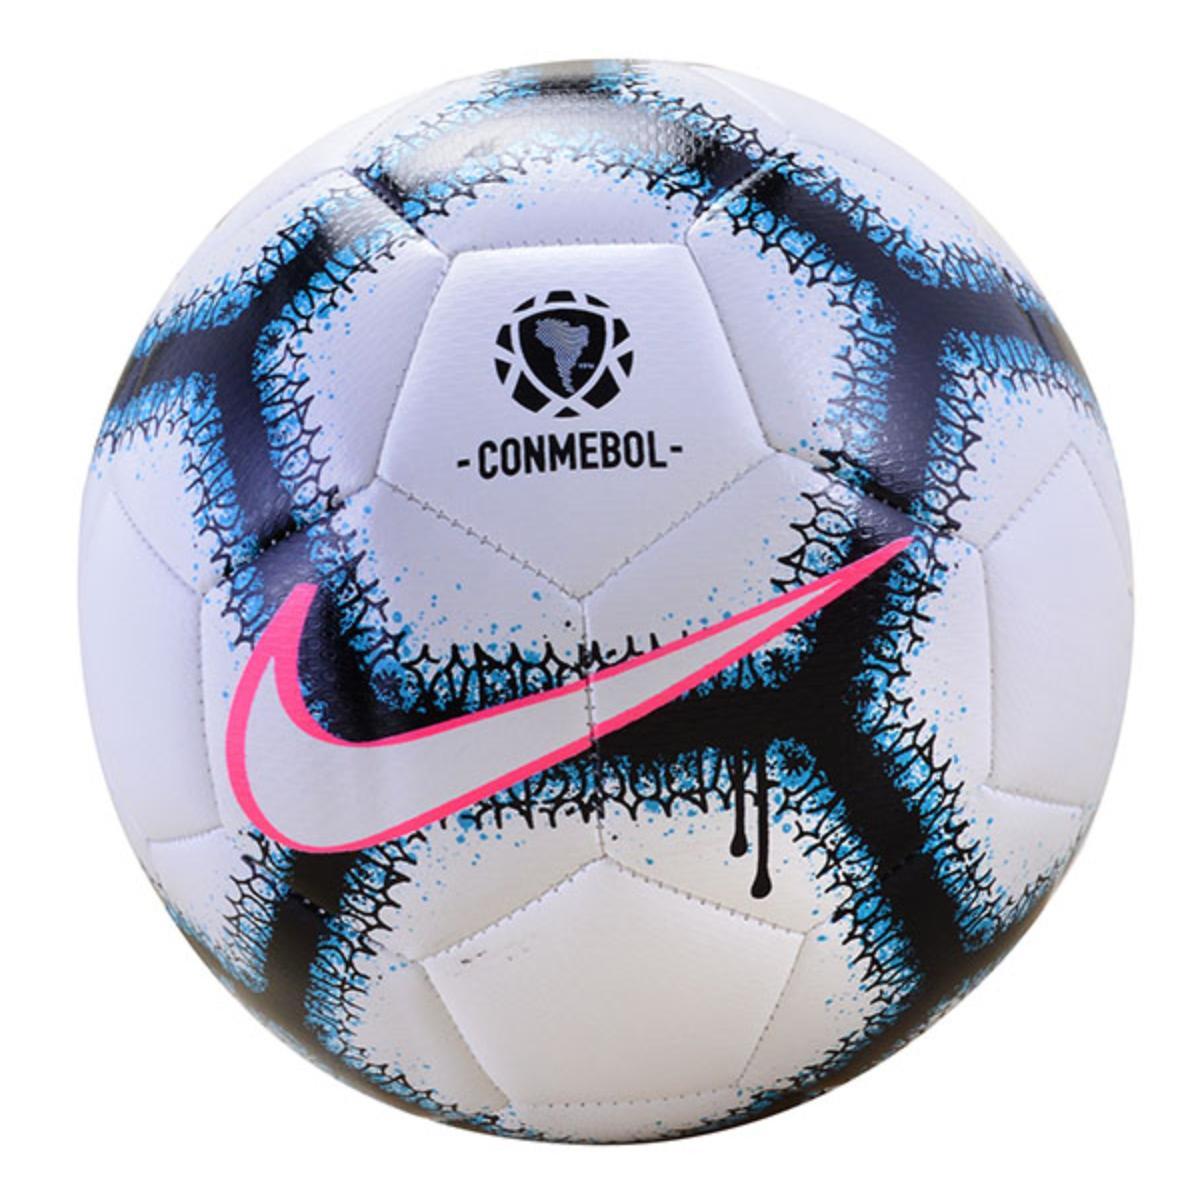 Bola Unisex Nike Sc3980-100 Copa America nk Menor x Branco/preto/azul/pink